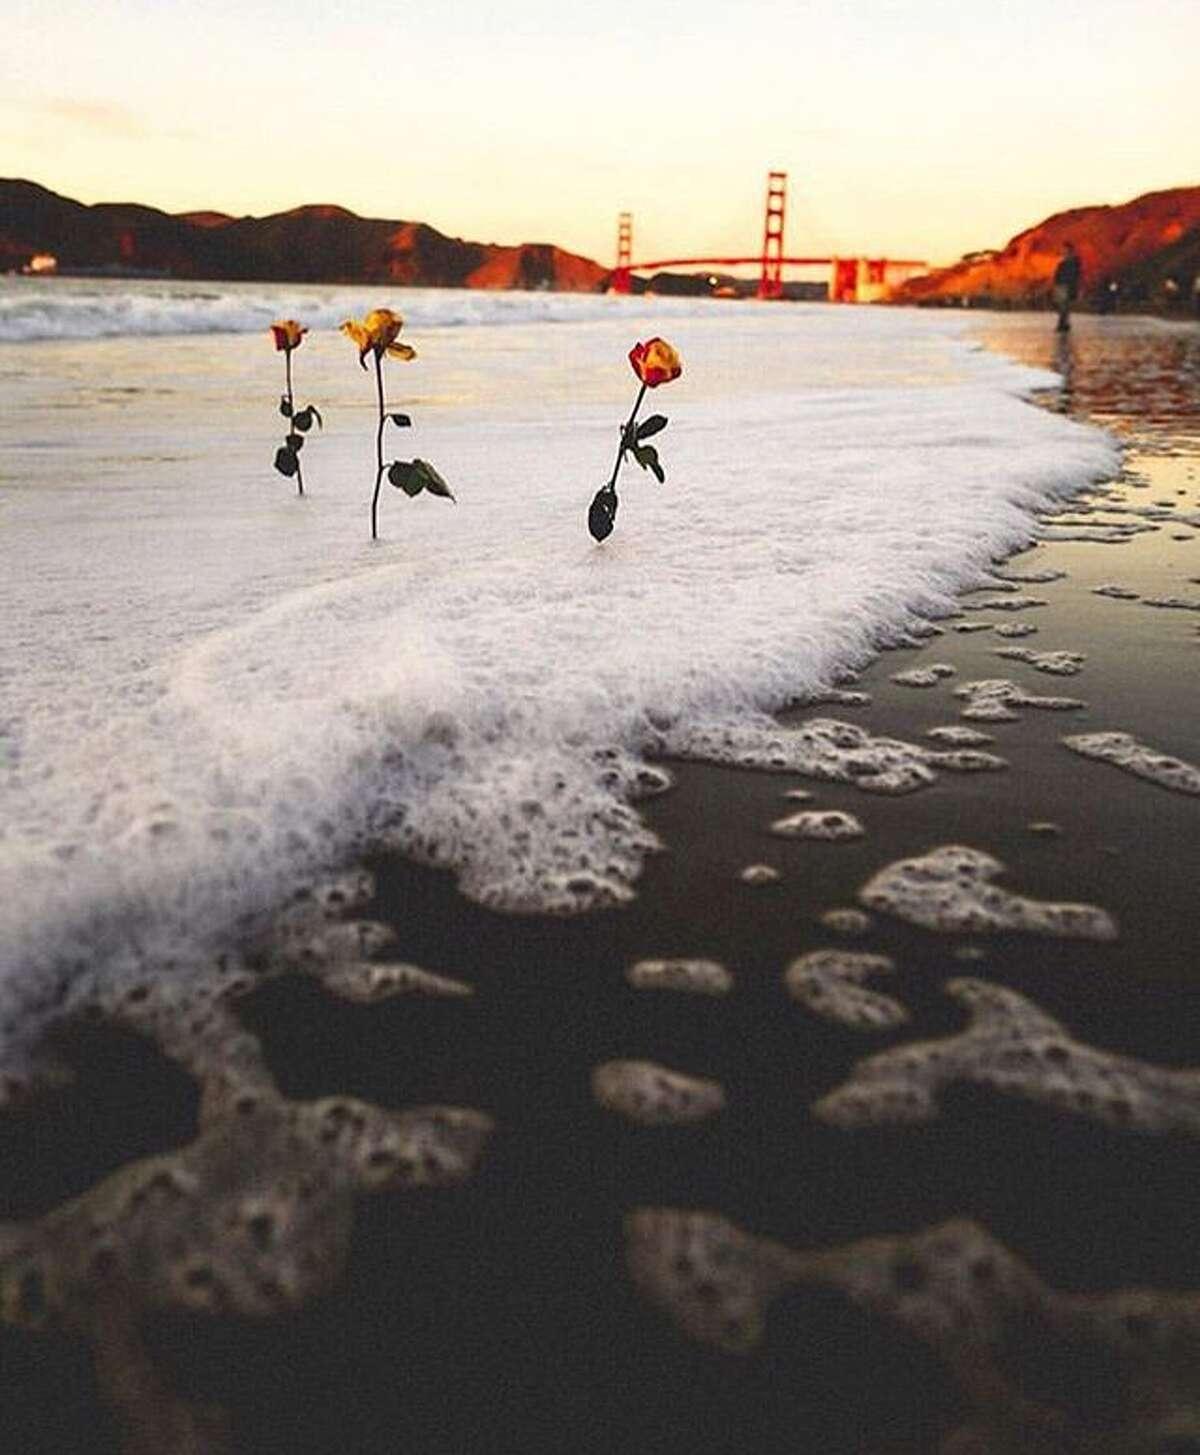 @_blvck_bvndit captured this romantic scene near the Golden Gate Bridge.